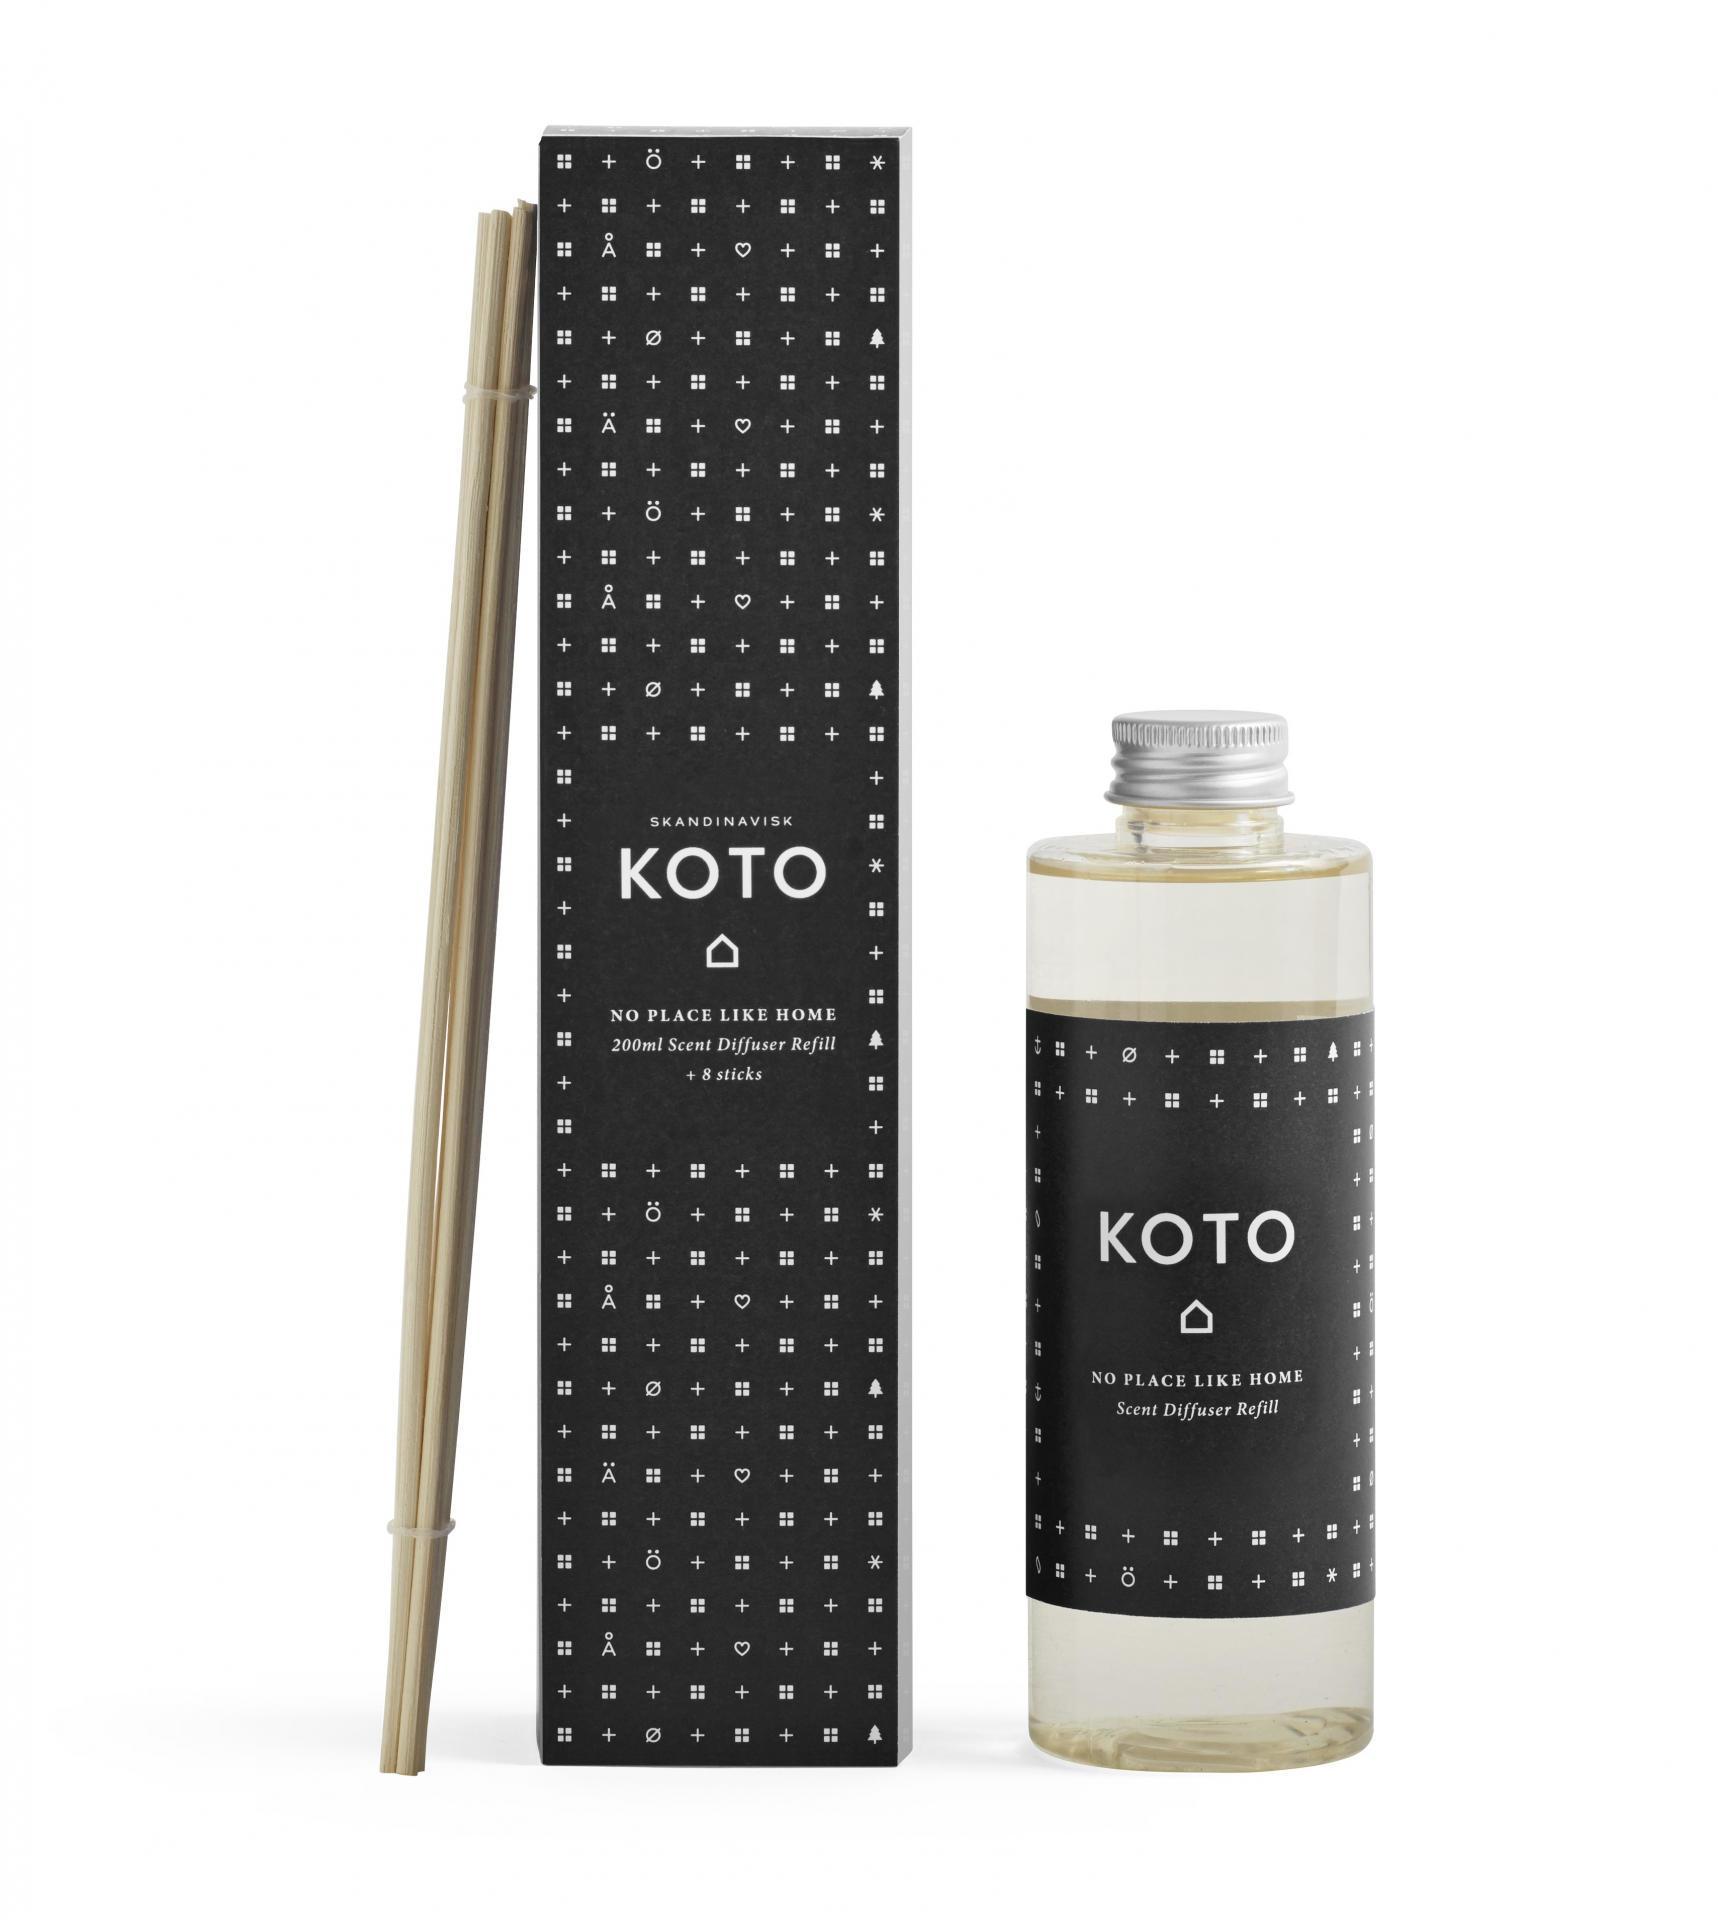 SKANDINAVISK Náhradní náplň do difuzéru KOTO (domov) 200 ml, černá barva, plast